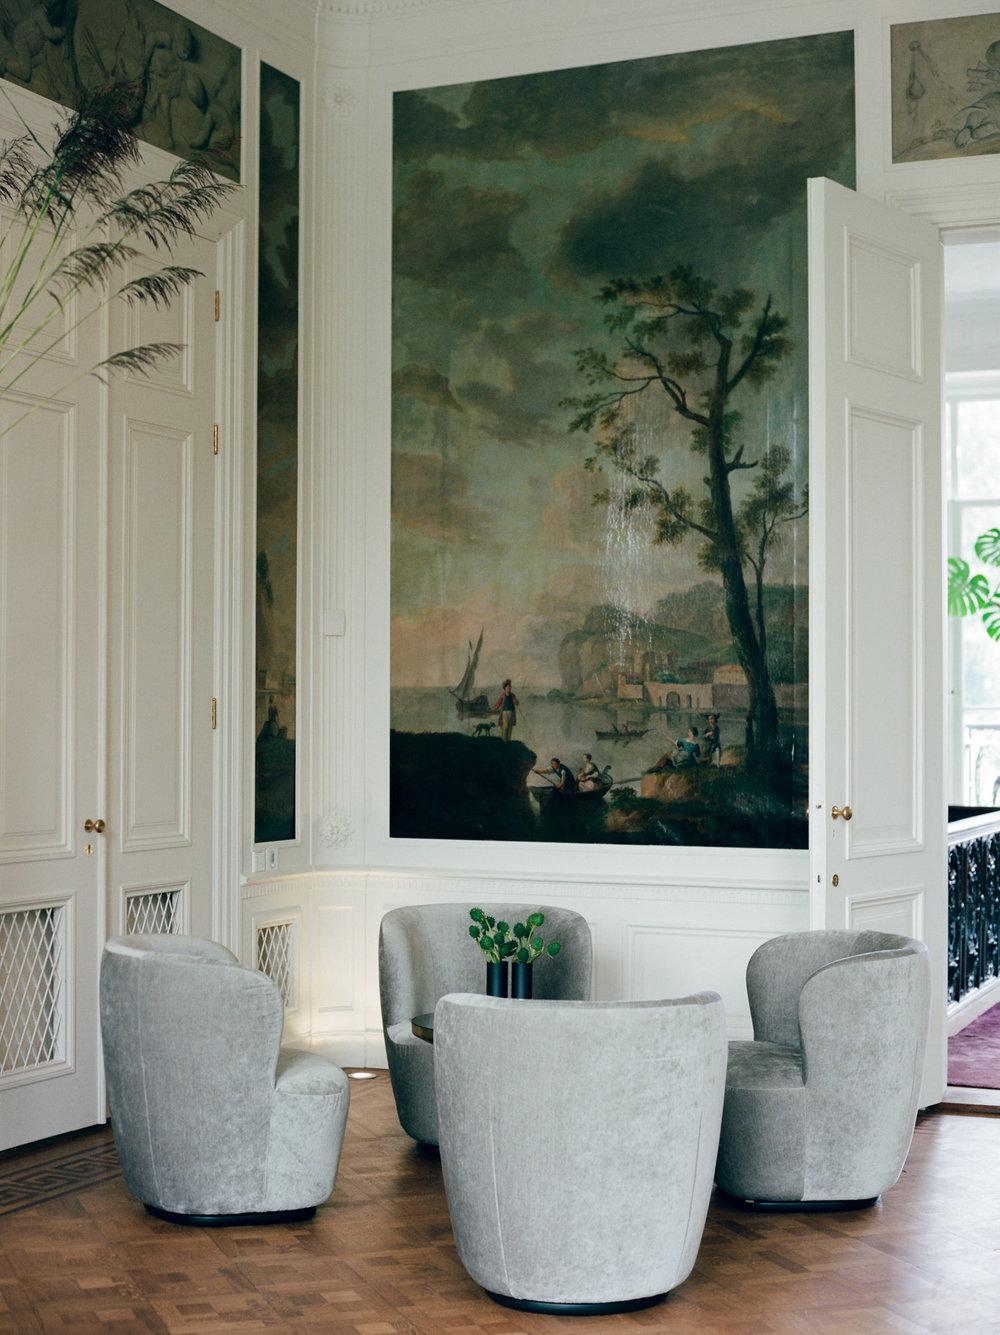 teneilkable_amsterdam-179.jpg